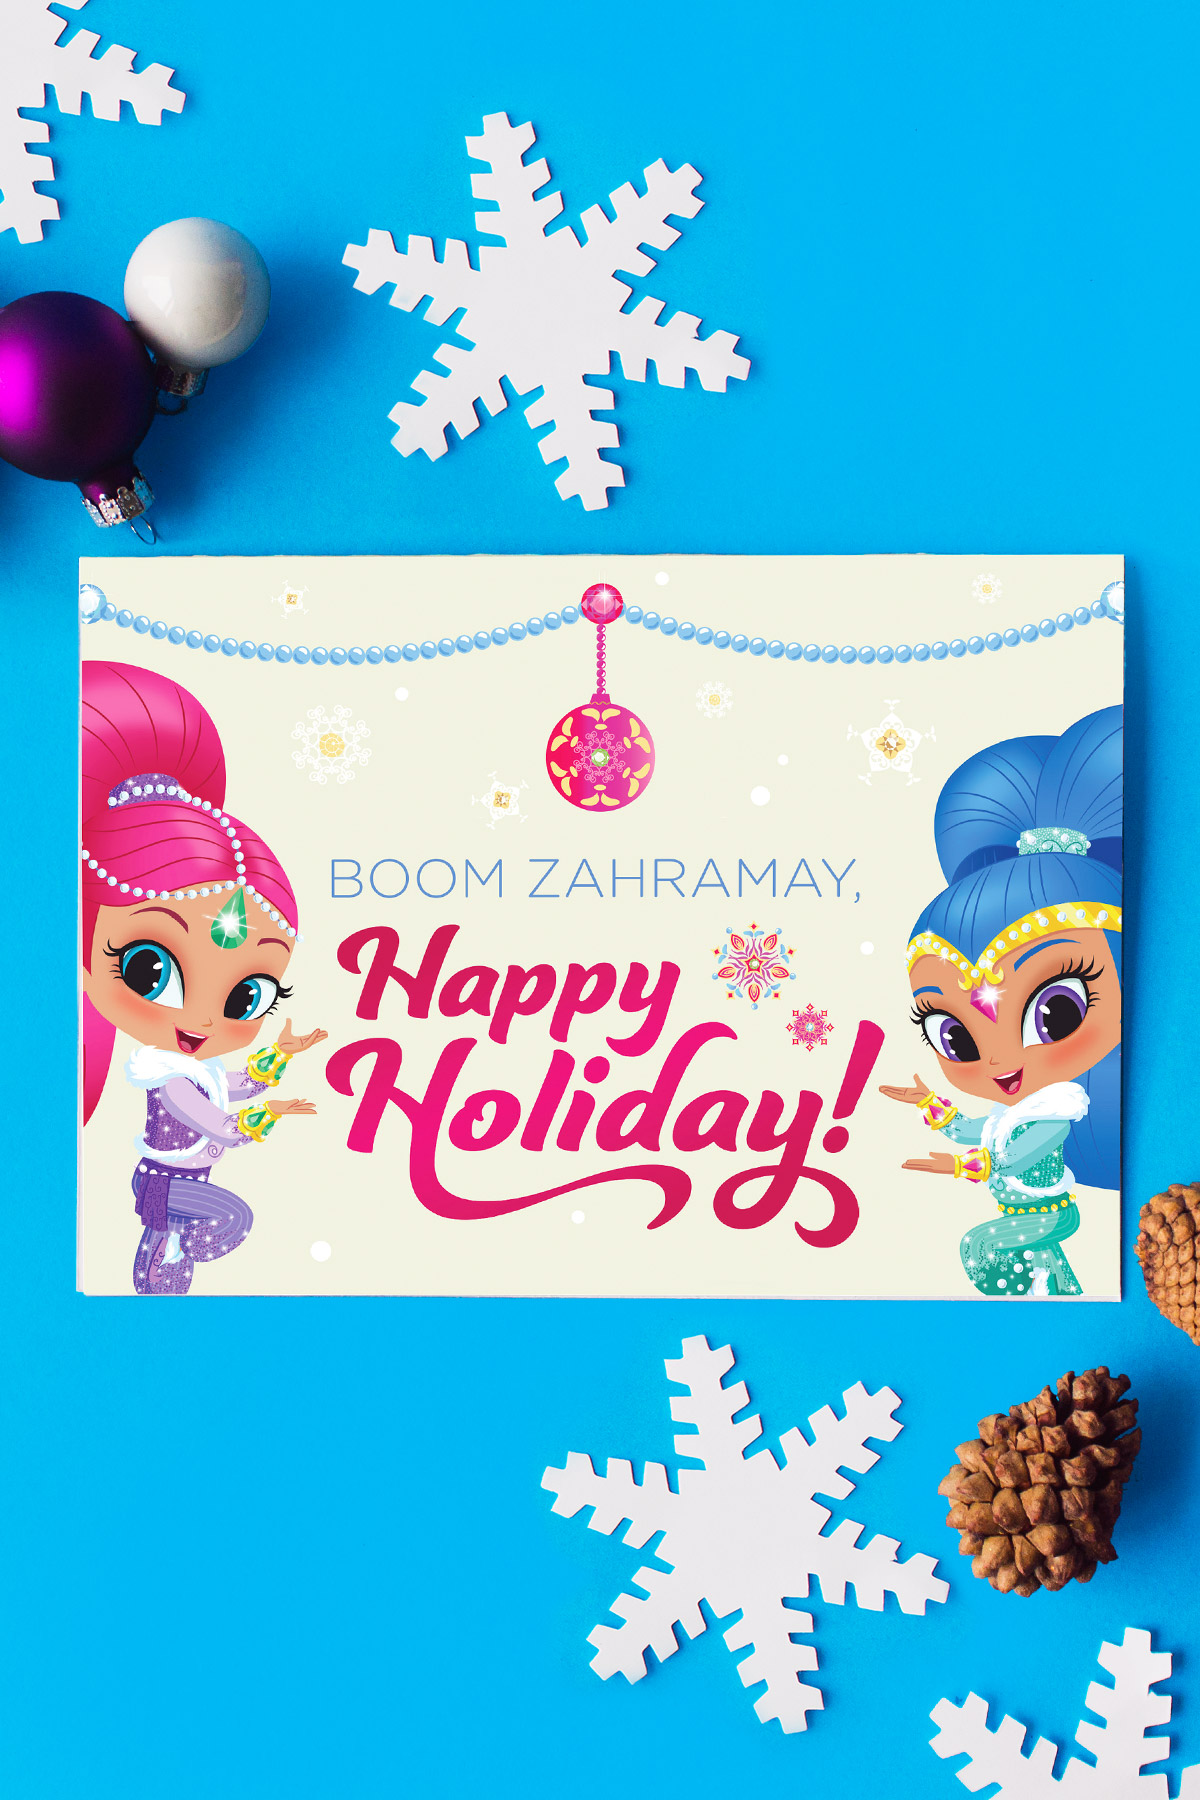 Shimmer Amp Shine Holiday Card Nickelodeon Parents